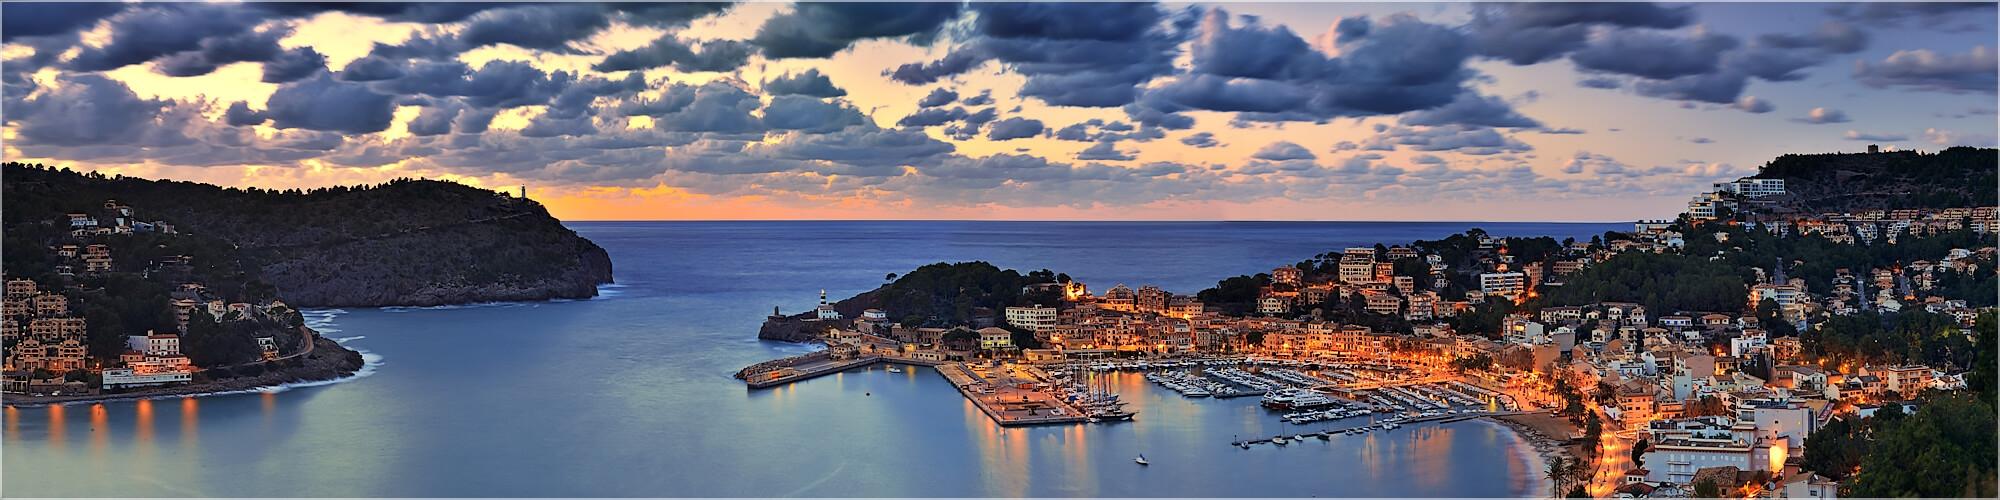 Panoramabild Mallorca Port Soller am Abend